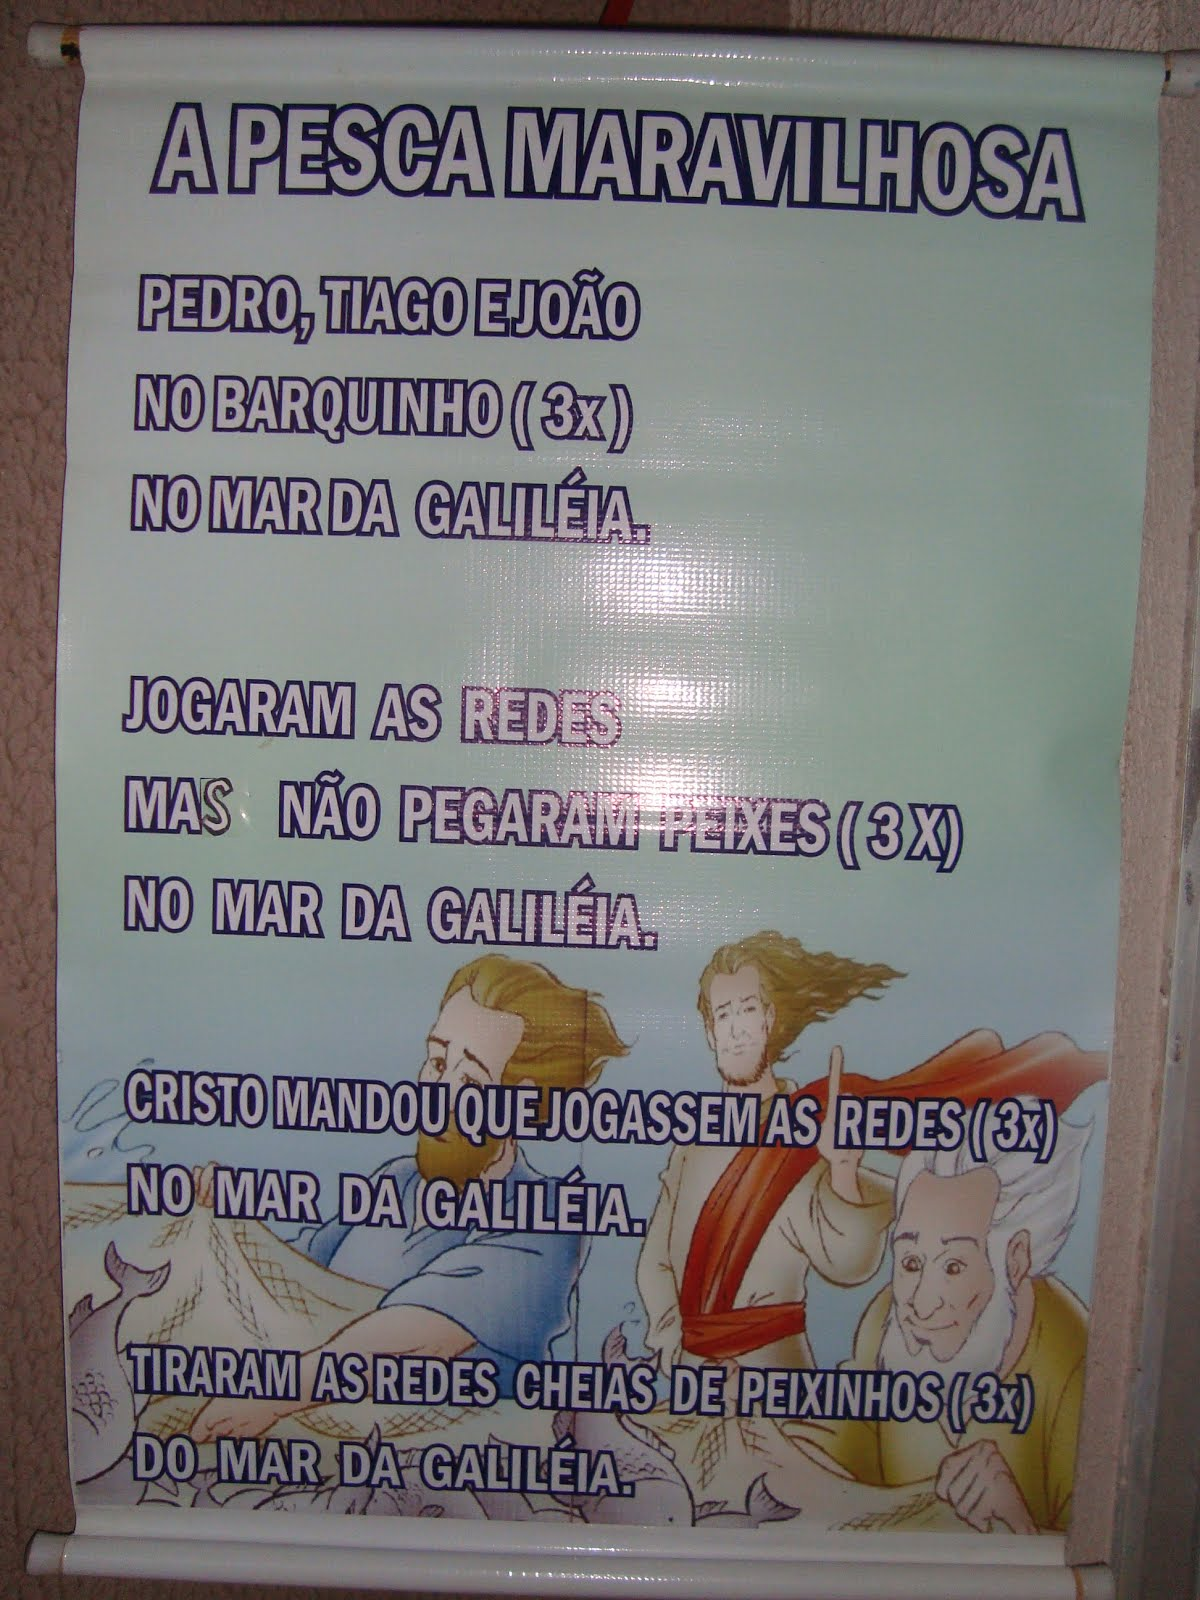 A PESCA MARAVILHOSA-MÚSICA